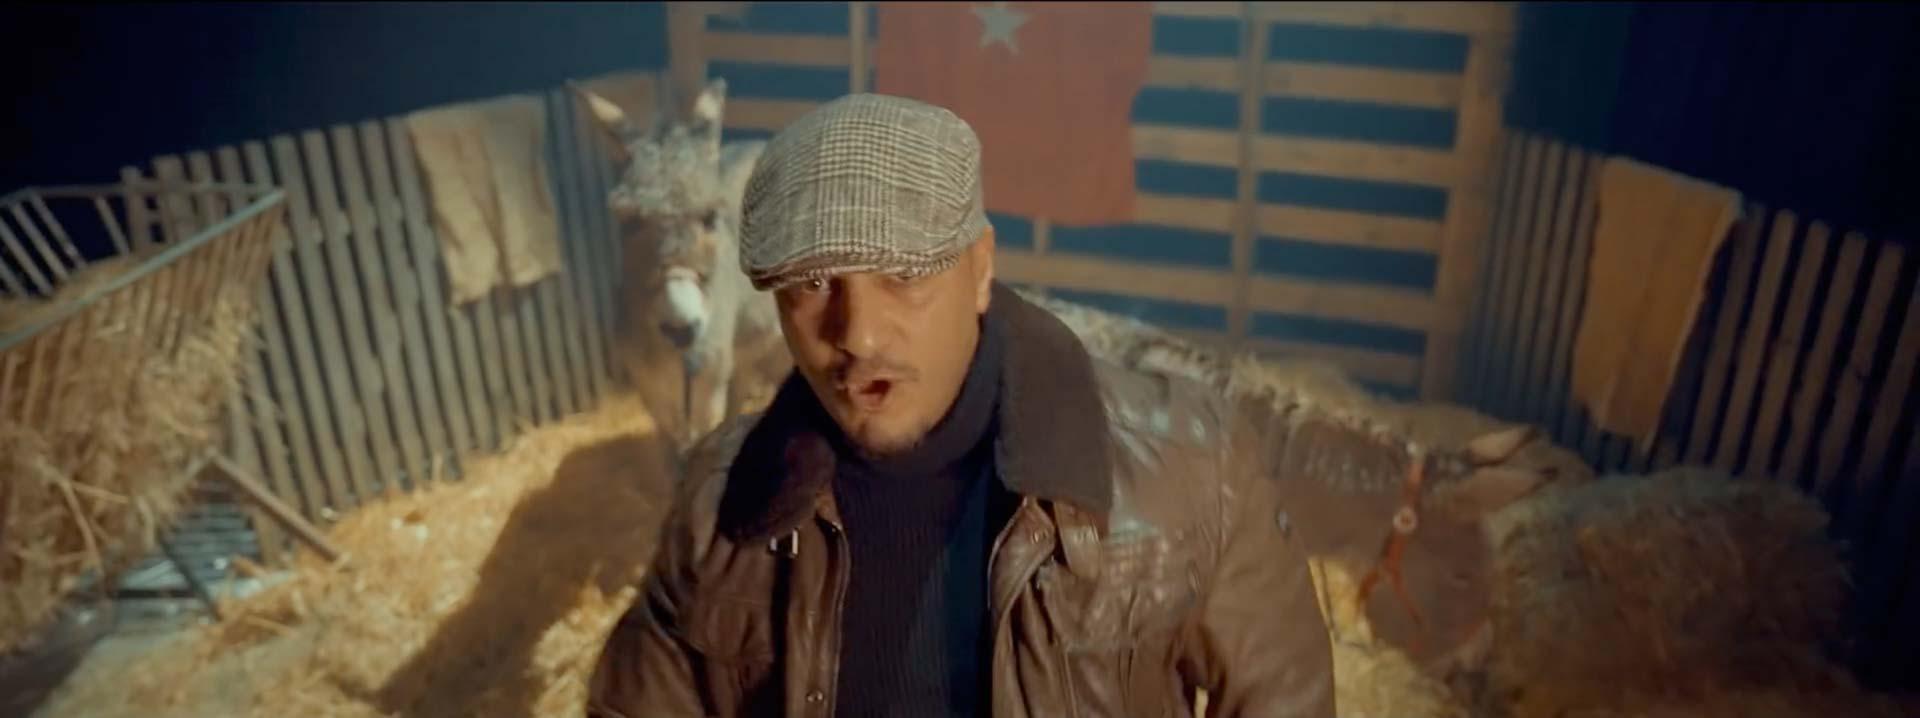 Musikvideo Screenshot Alpa Gun Bize Ne